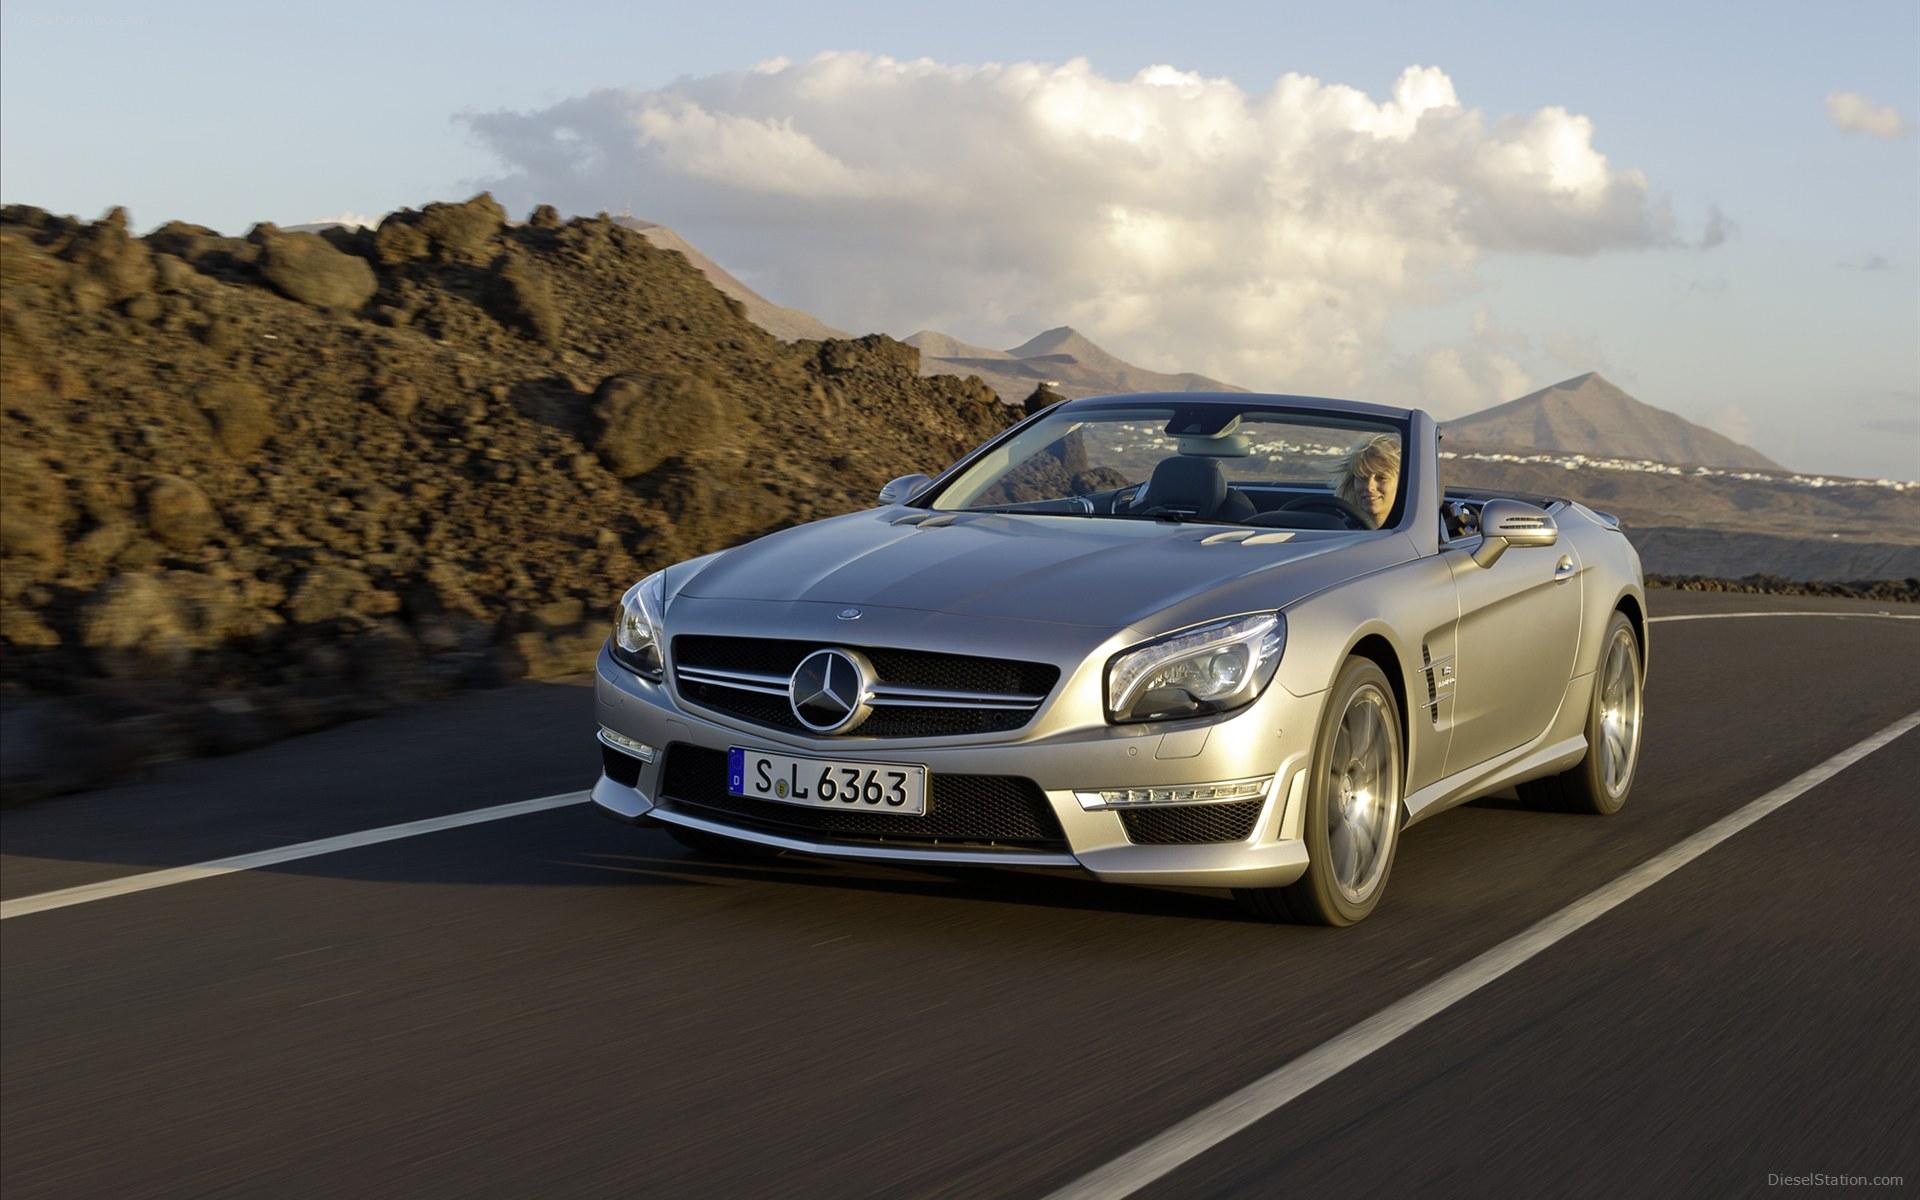 Mercedes Benz SL63 AMG3 Design Ideas